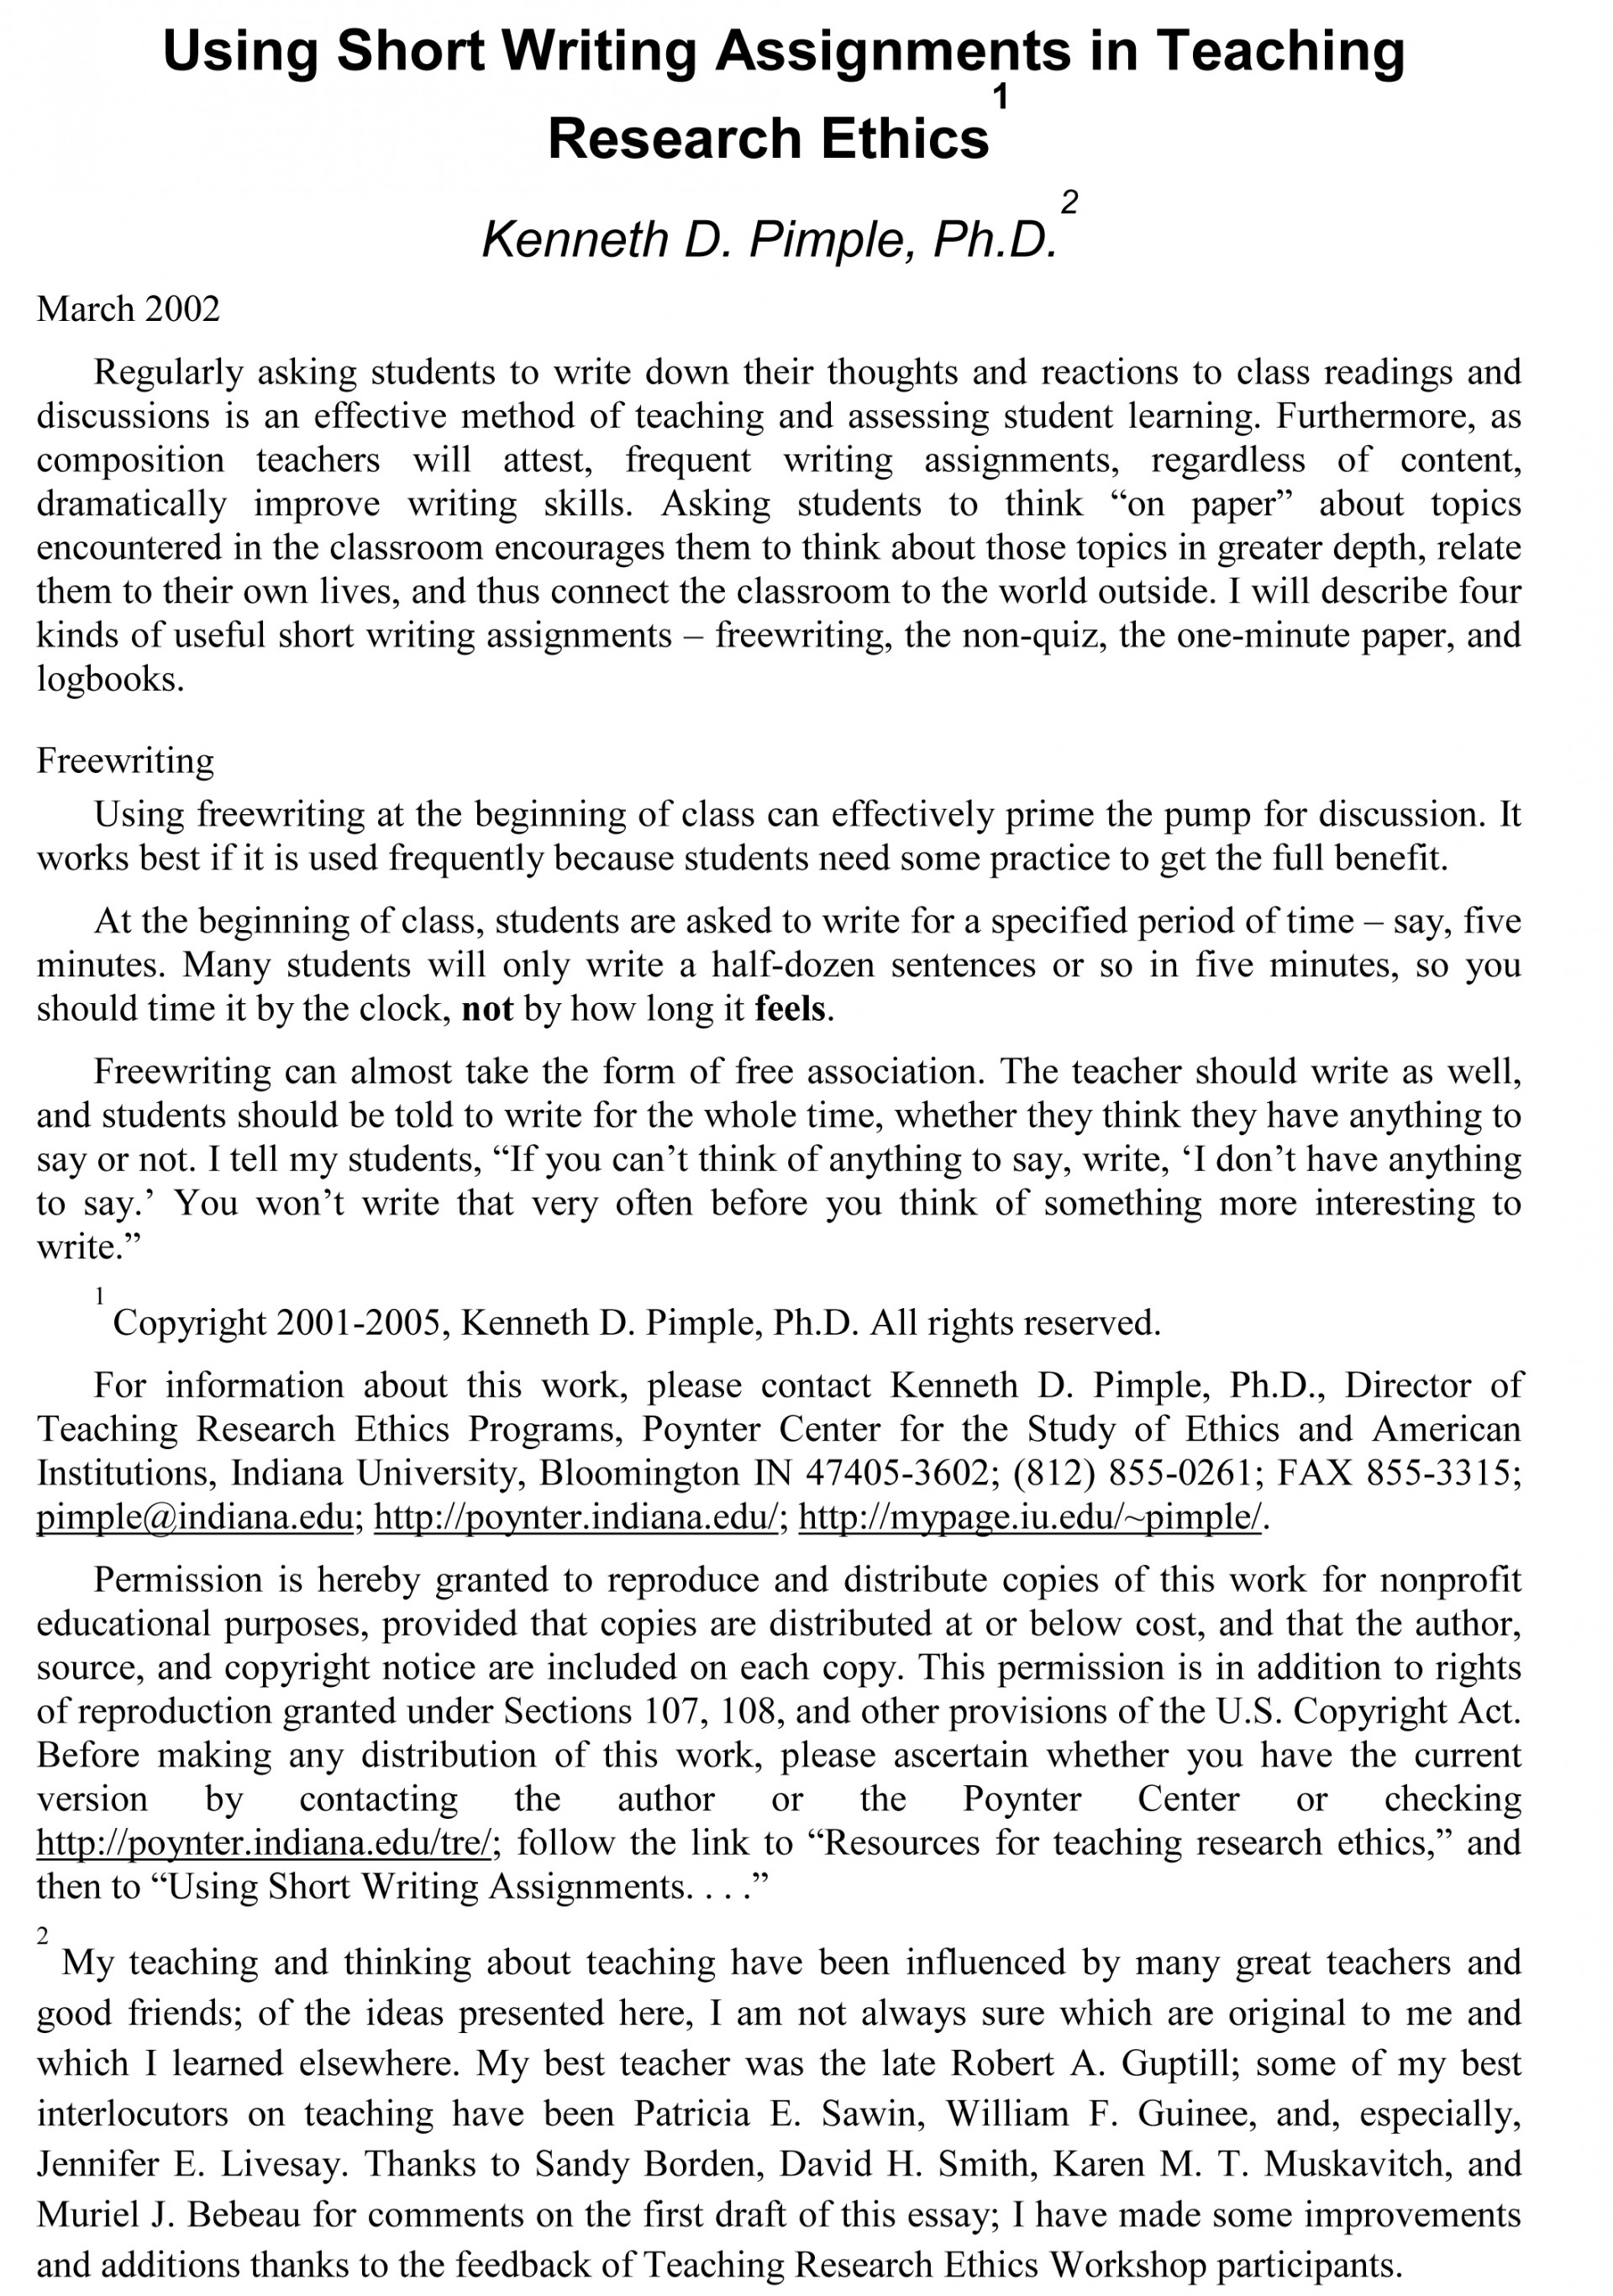 002 Sample Teaching College Essay Writing Imposing Service Reddit Custom Application Help 1920